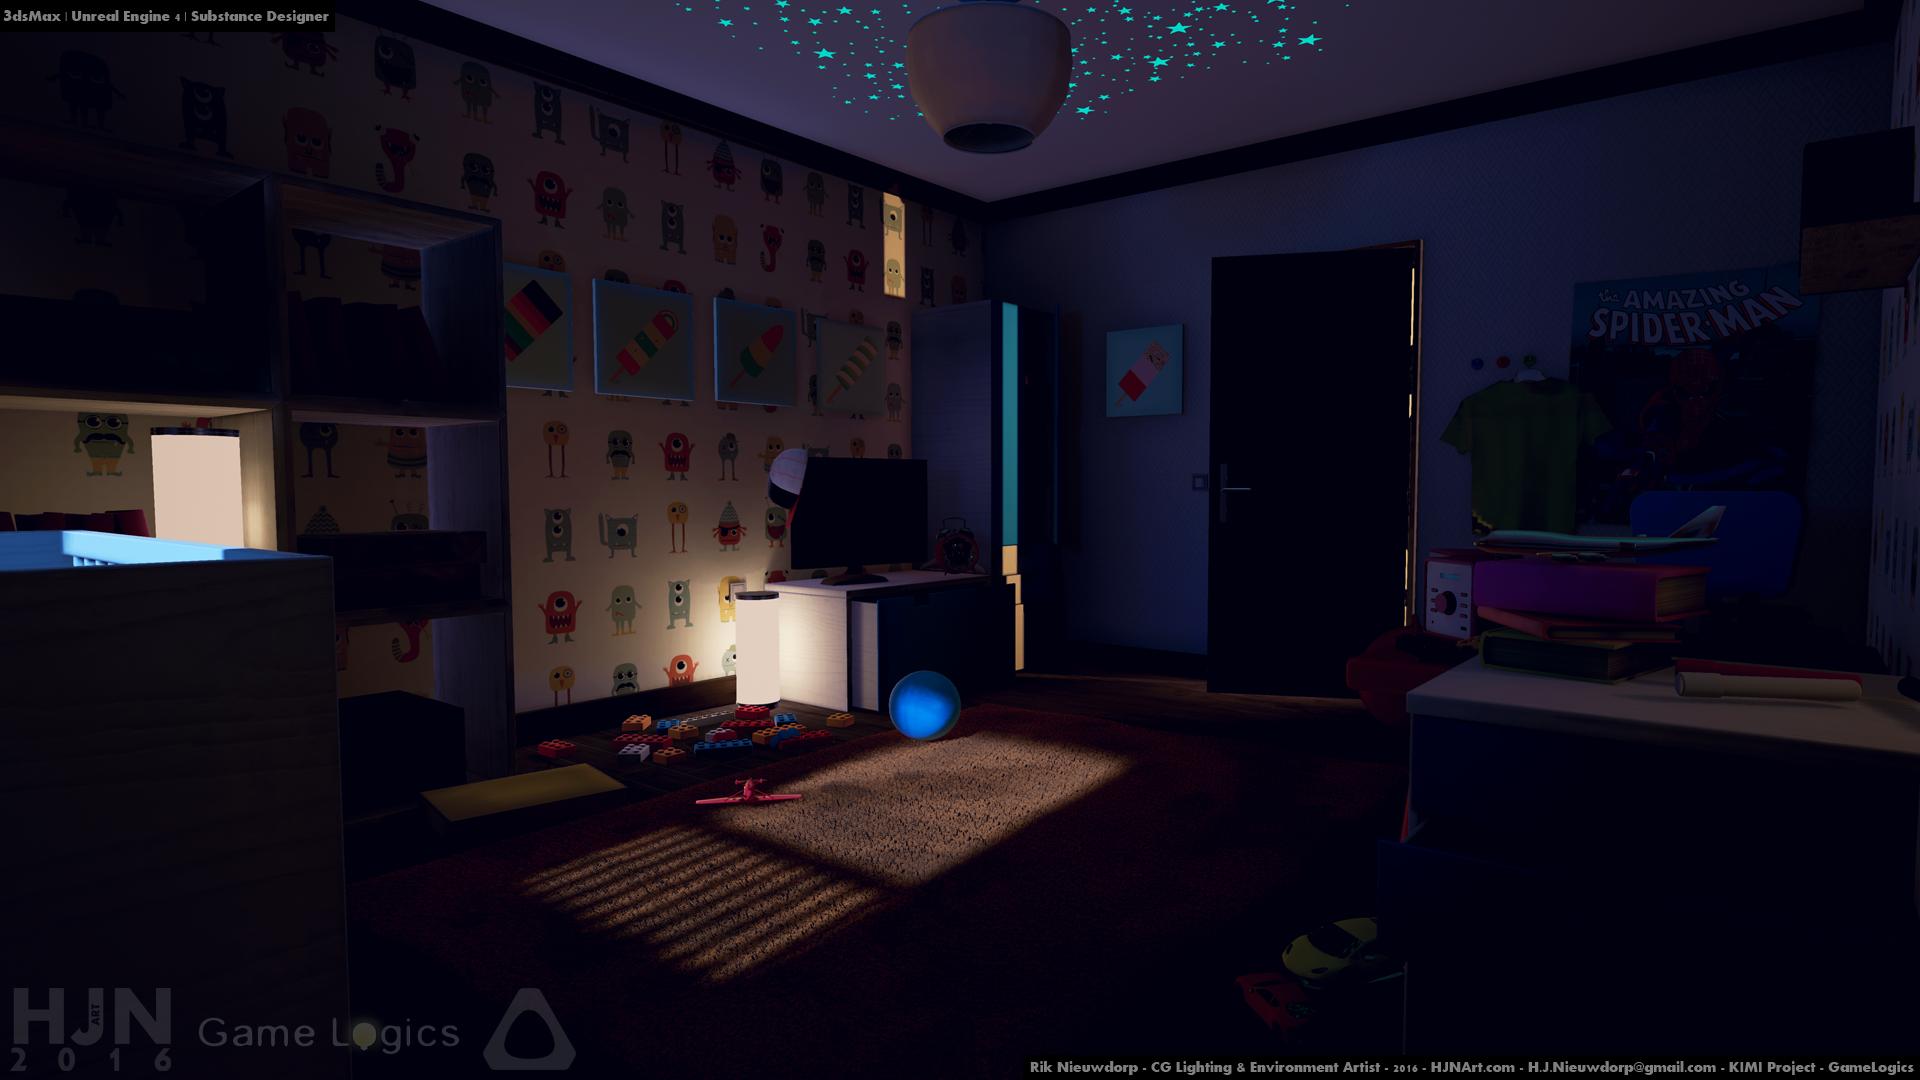 HJN_GL_KIMI_RoomView_Dark_Cam3_PNG